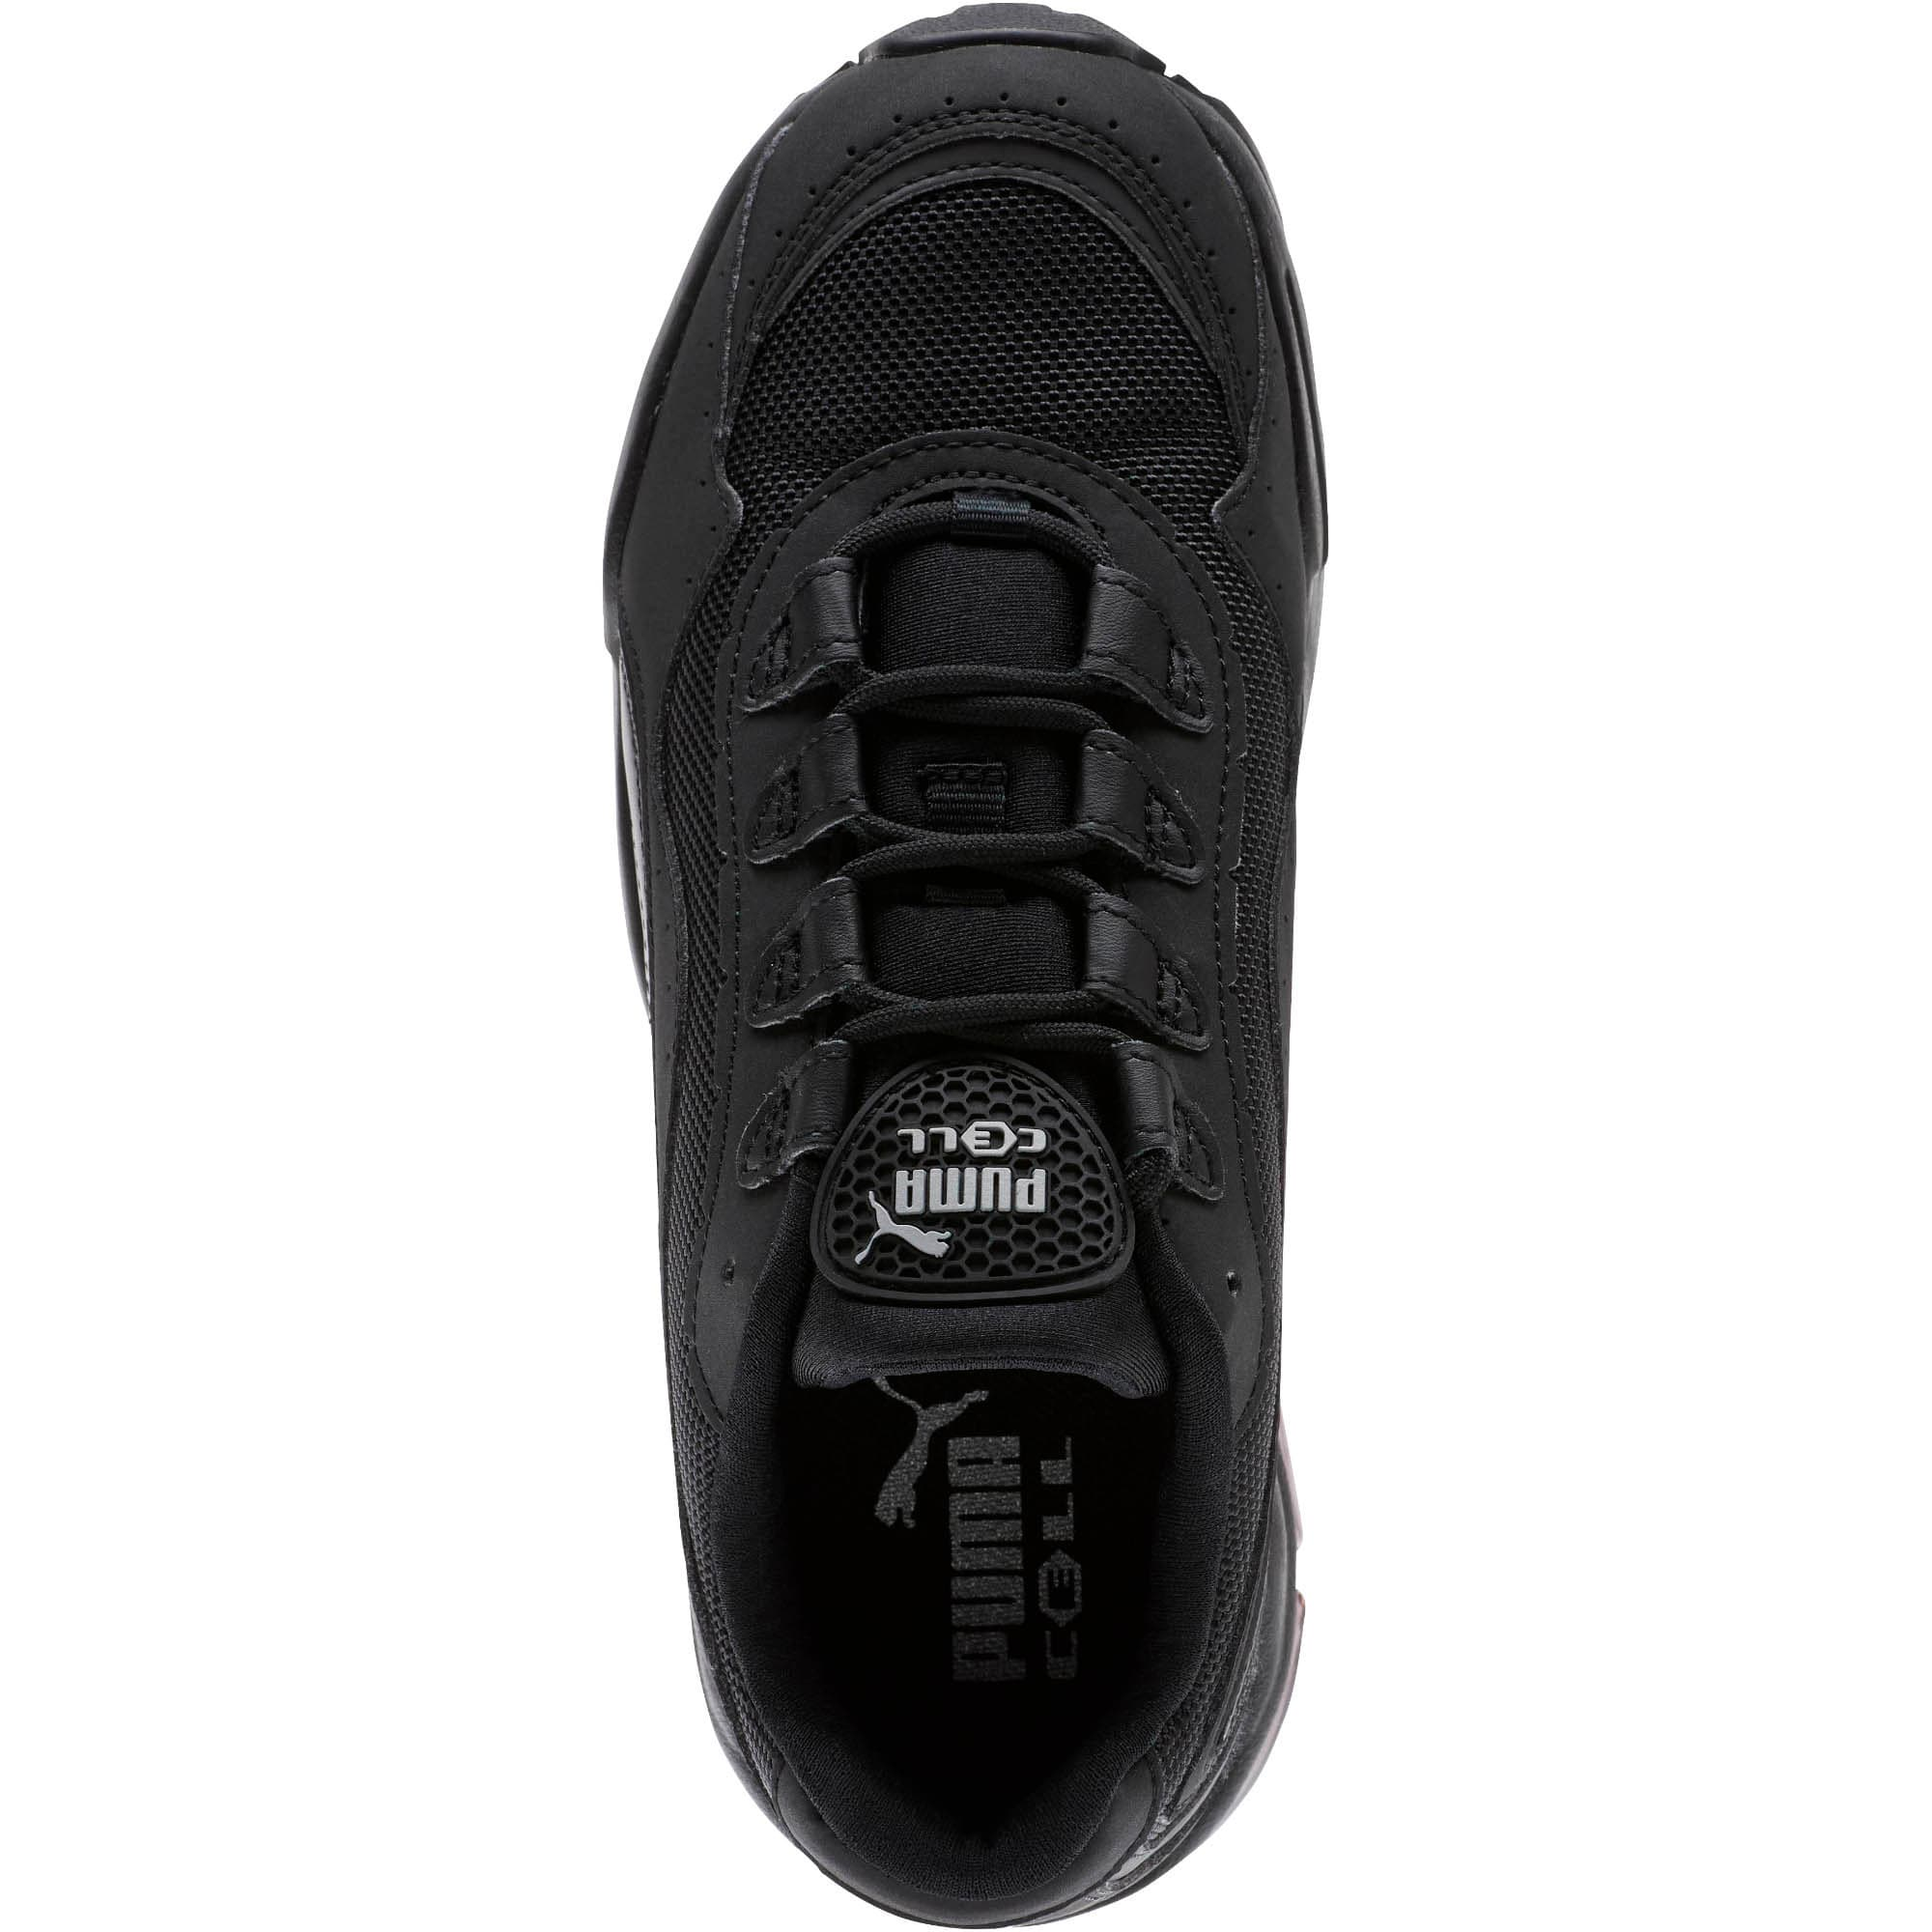 Thumbnail 5 of CELL Stellar Women's Sneakers, Puma Black-Silver, medium